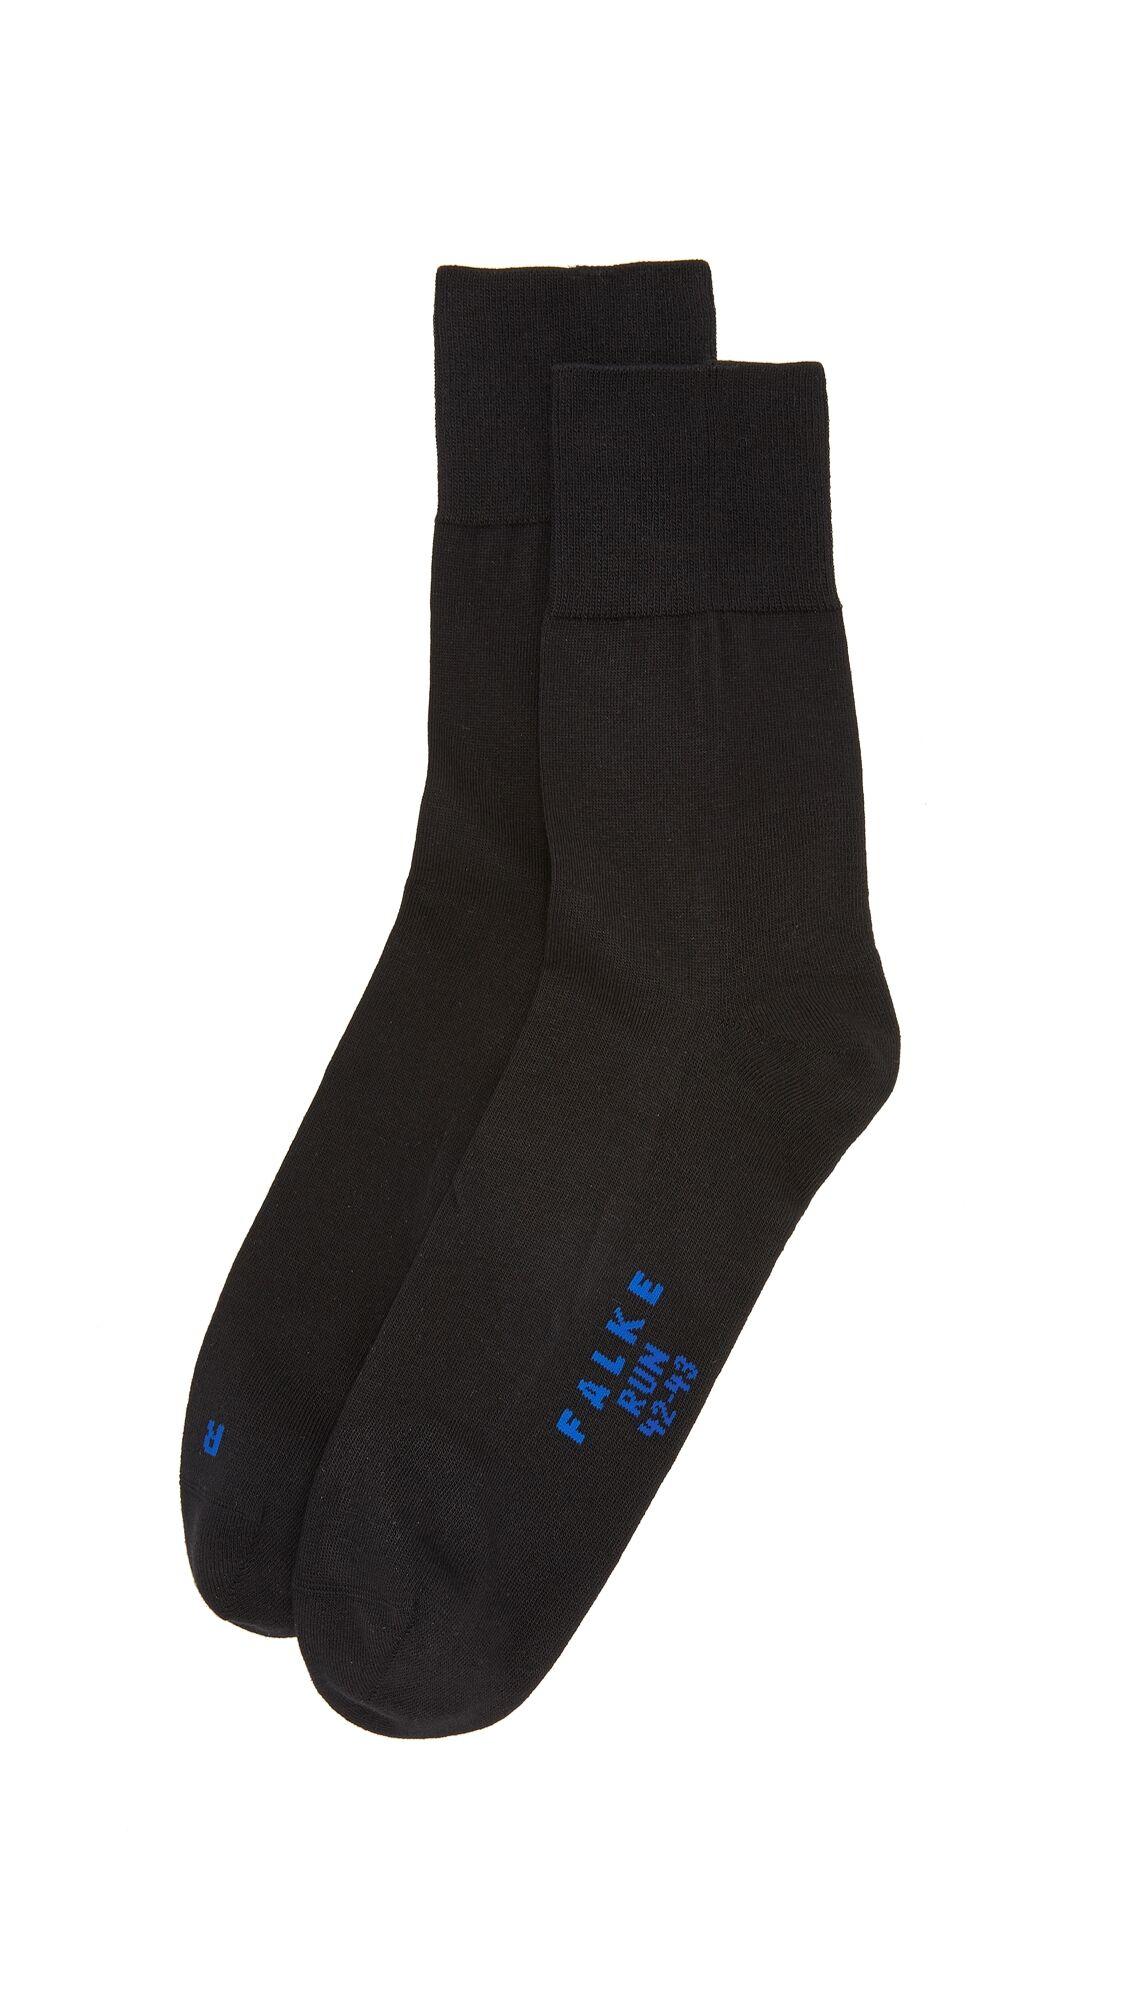 Falke Run Cotton Blend Socks - Black - Size: 39-41